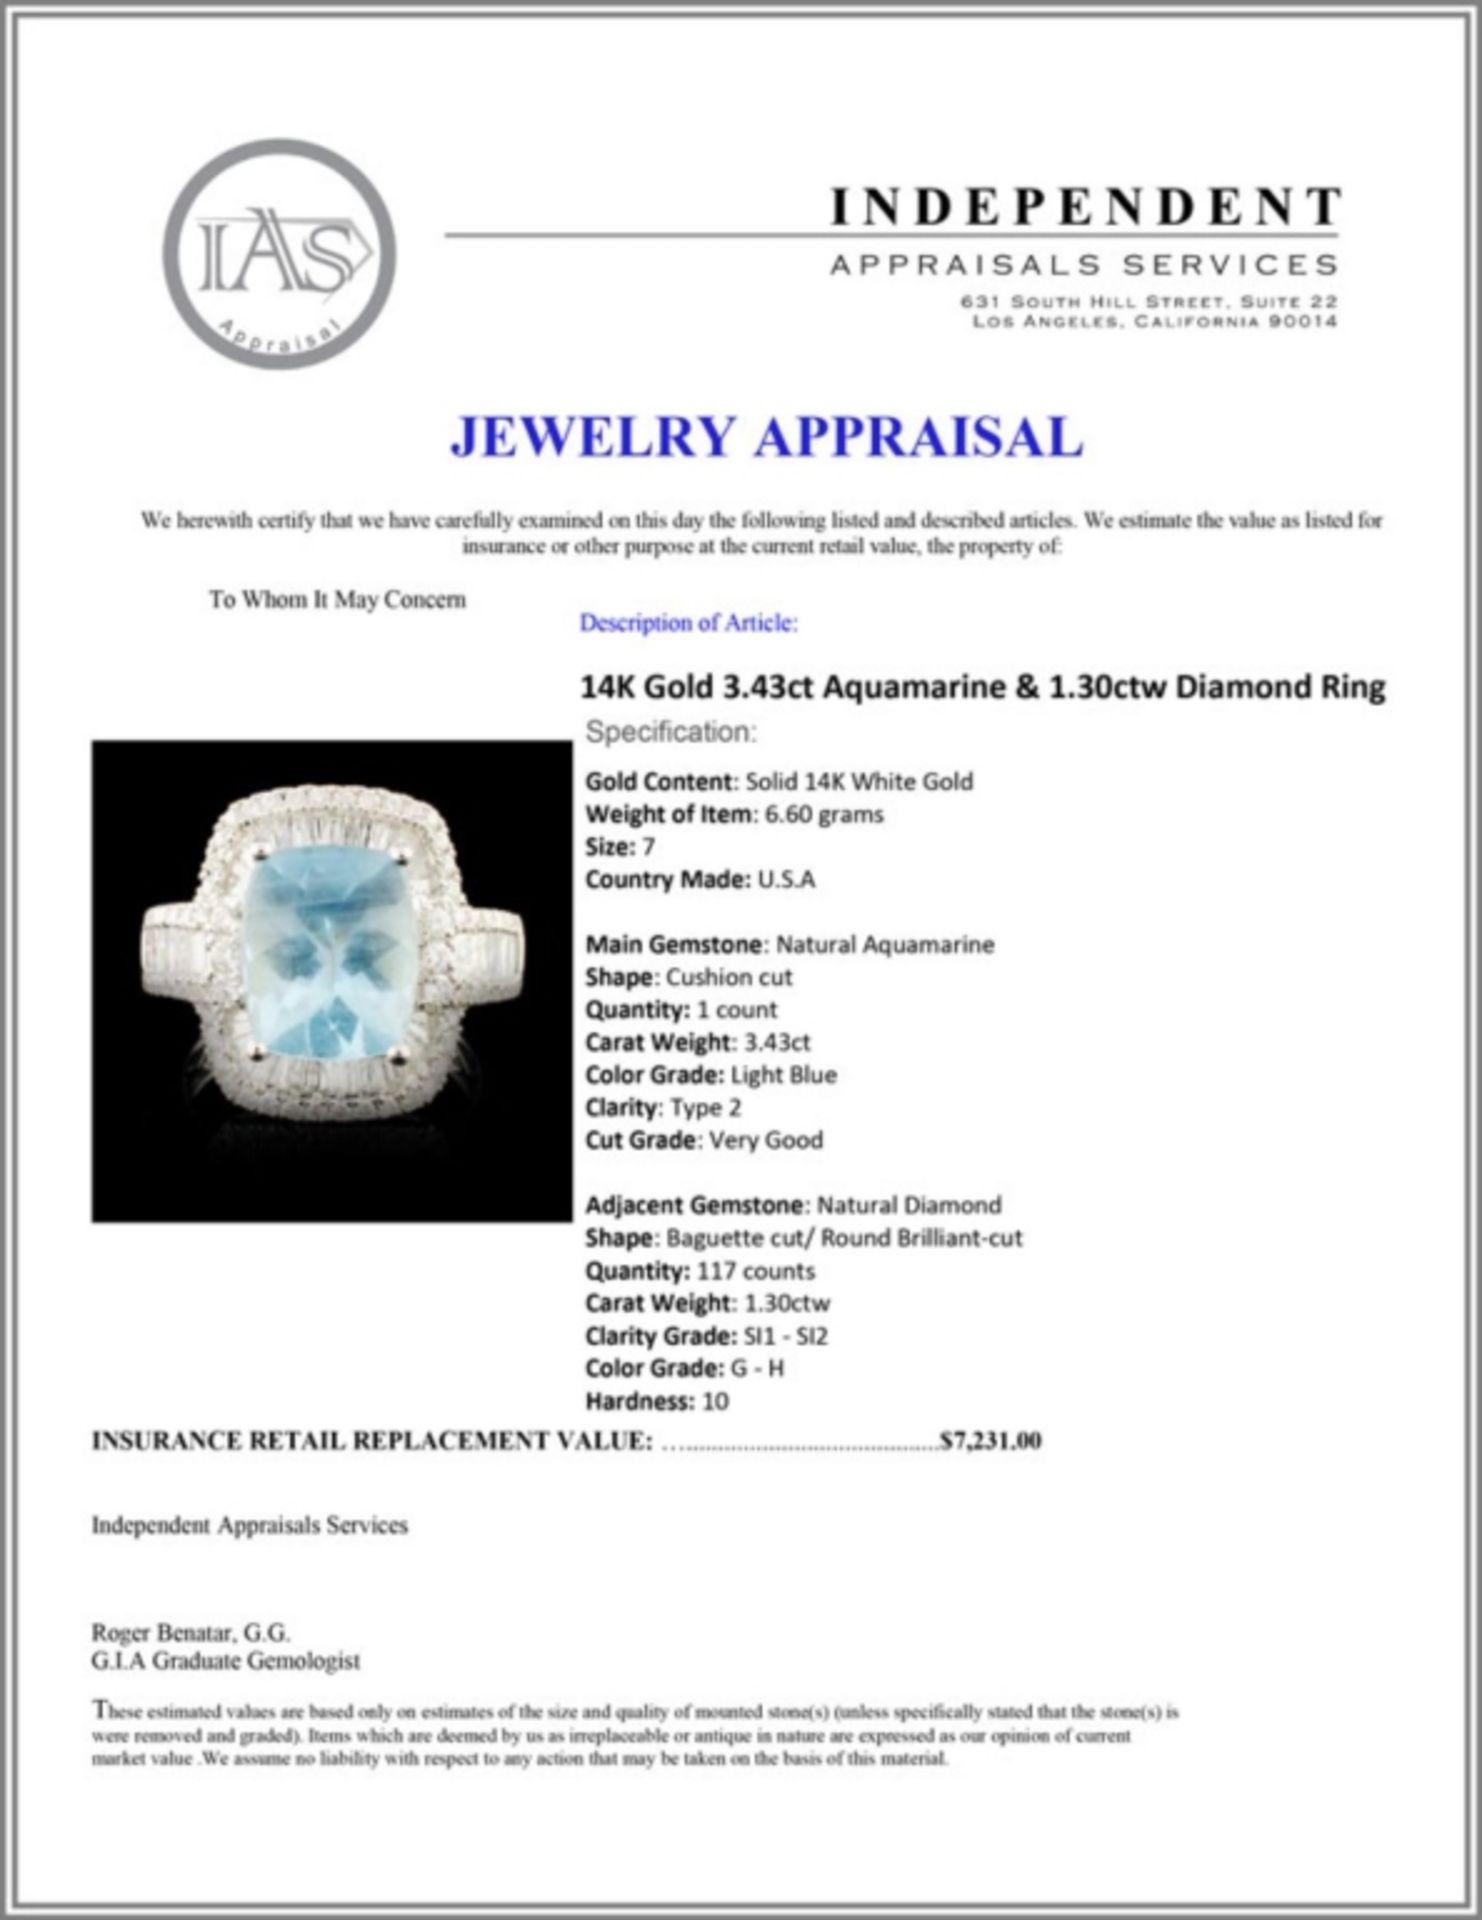 14K Gold 3.43ct Aquamarine & 1.30ctw Diamond Ring - Image 5 of 5